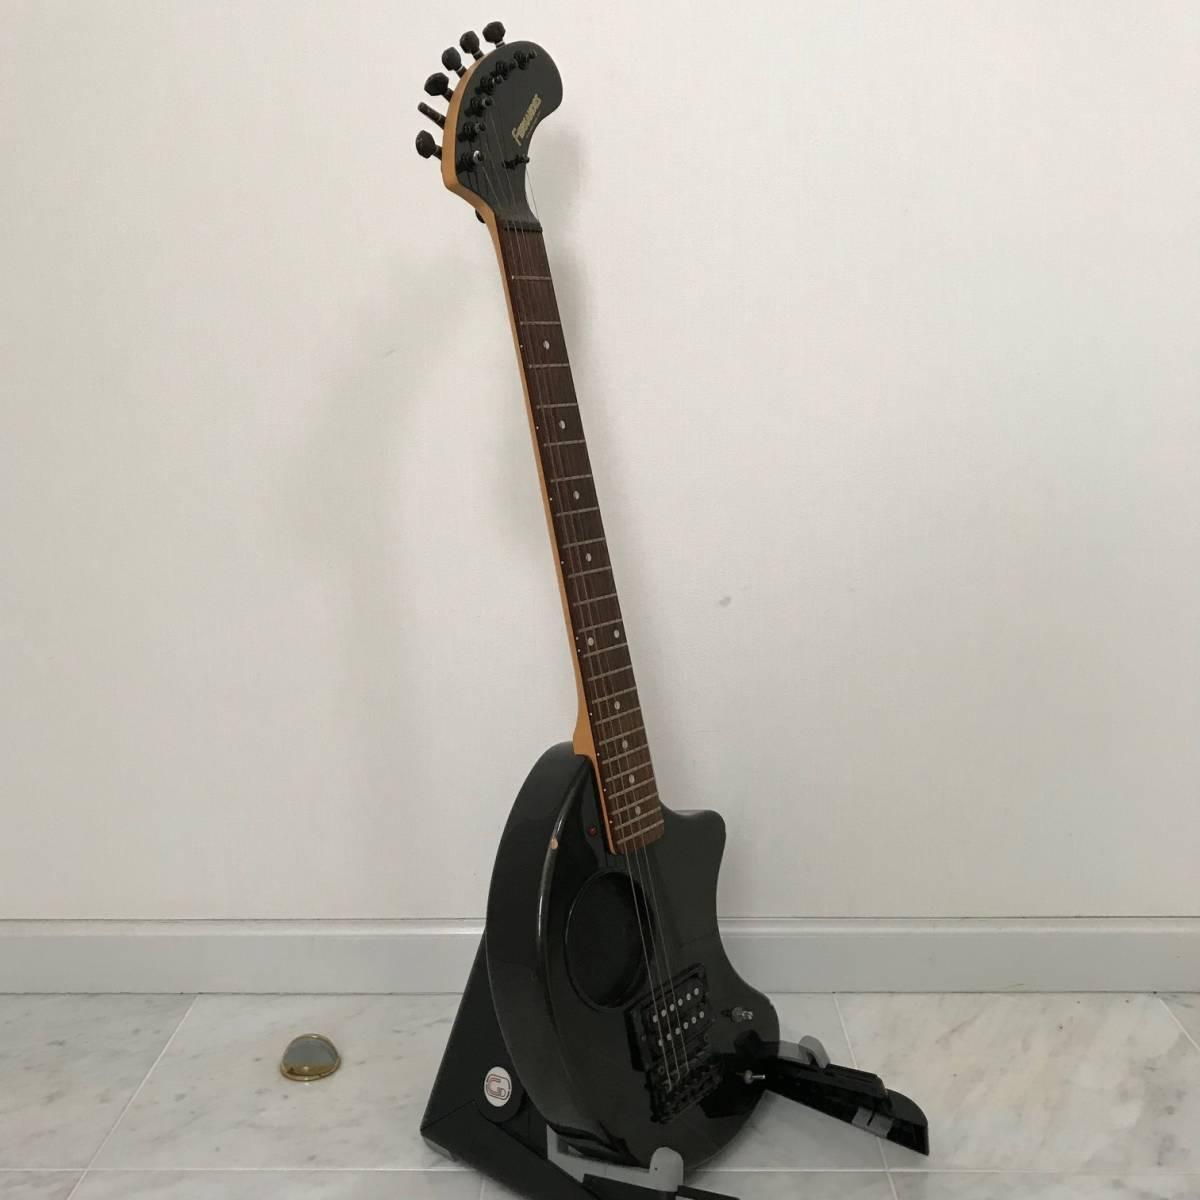 ZO-3 芸達者 ディストーション アンプ内臓 GOTOHペグ ギター ブラックメタリック ジャンク FERNANDES_画像6